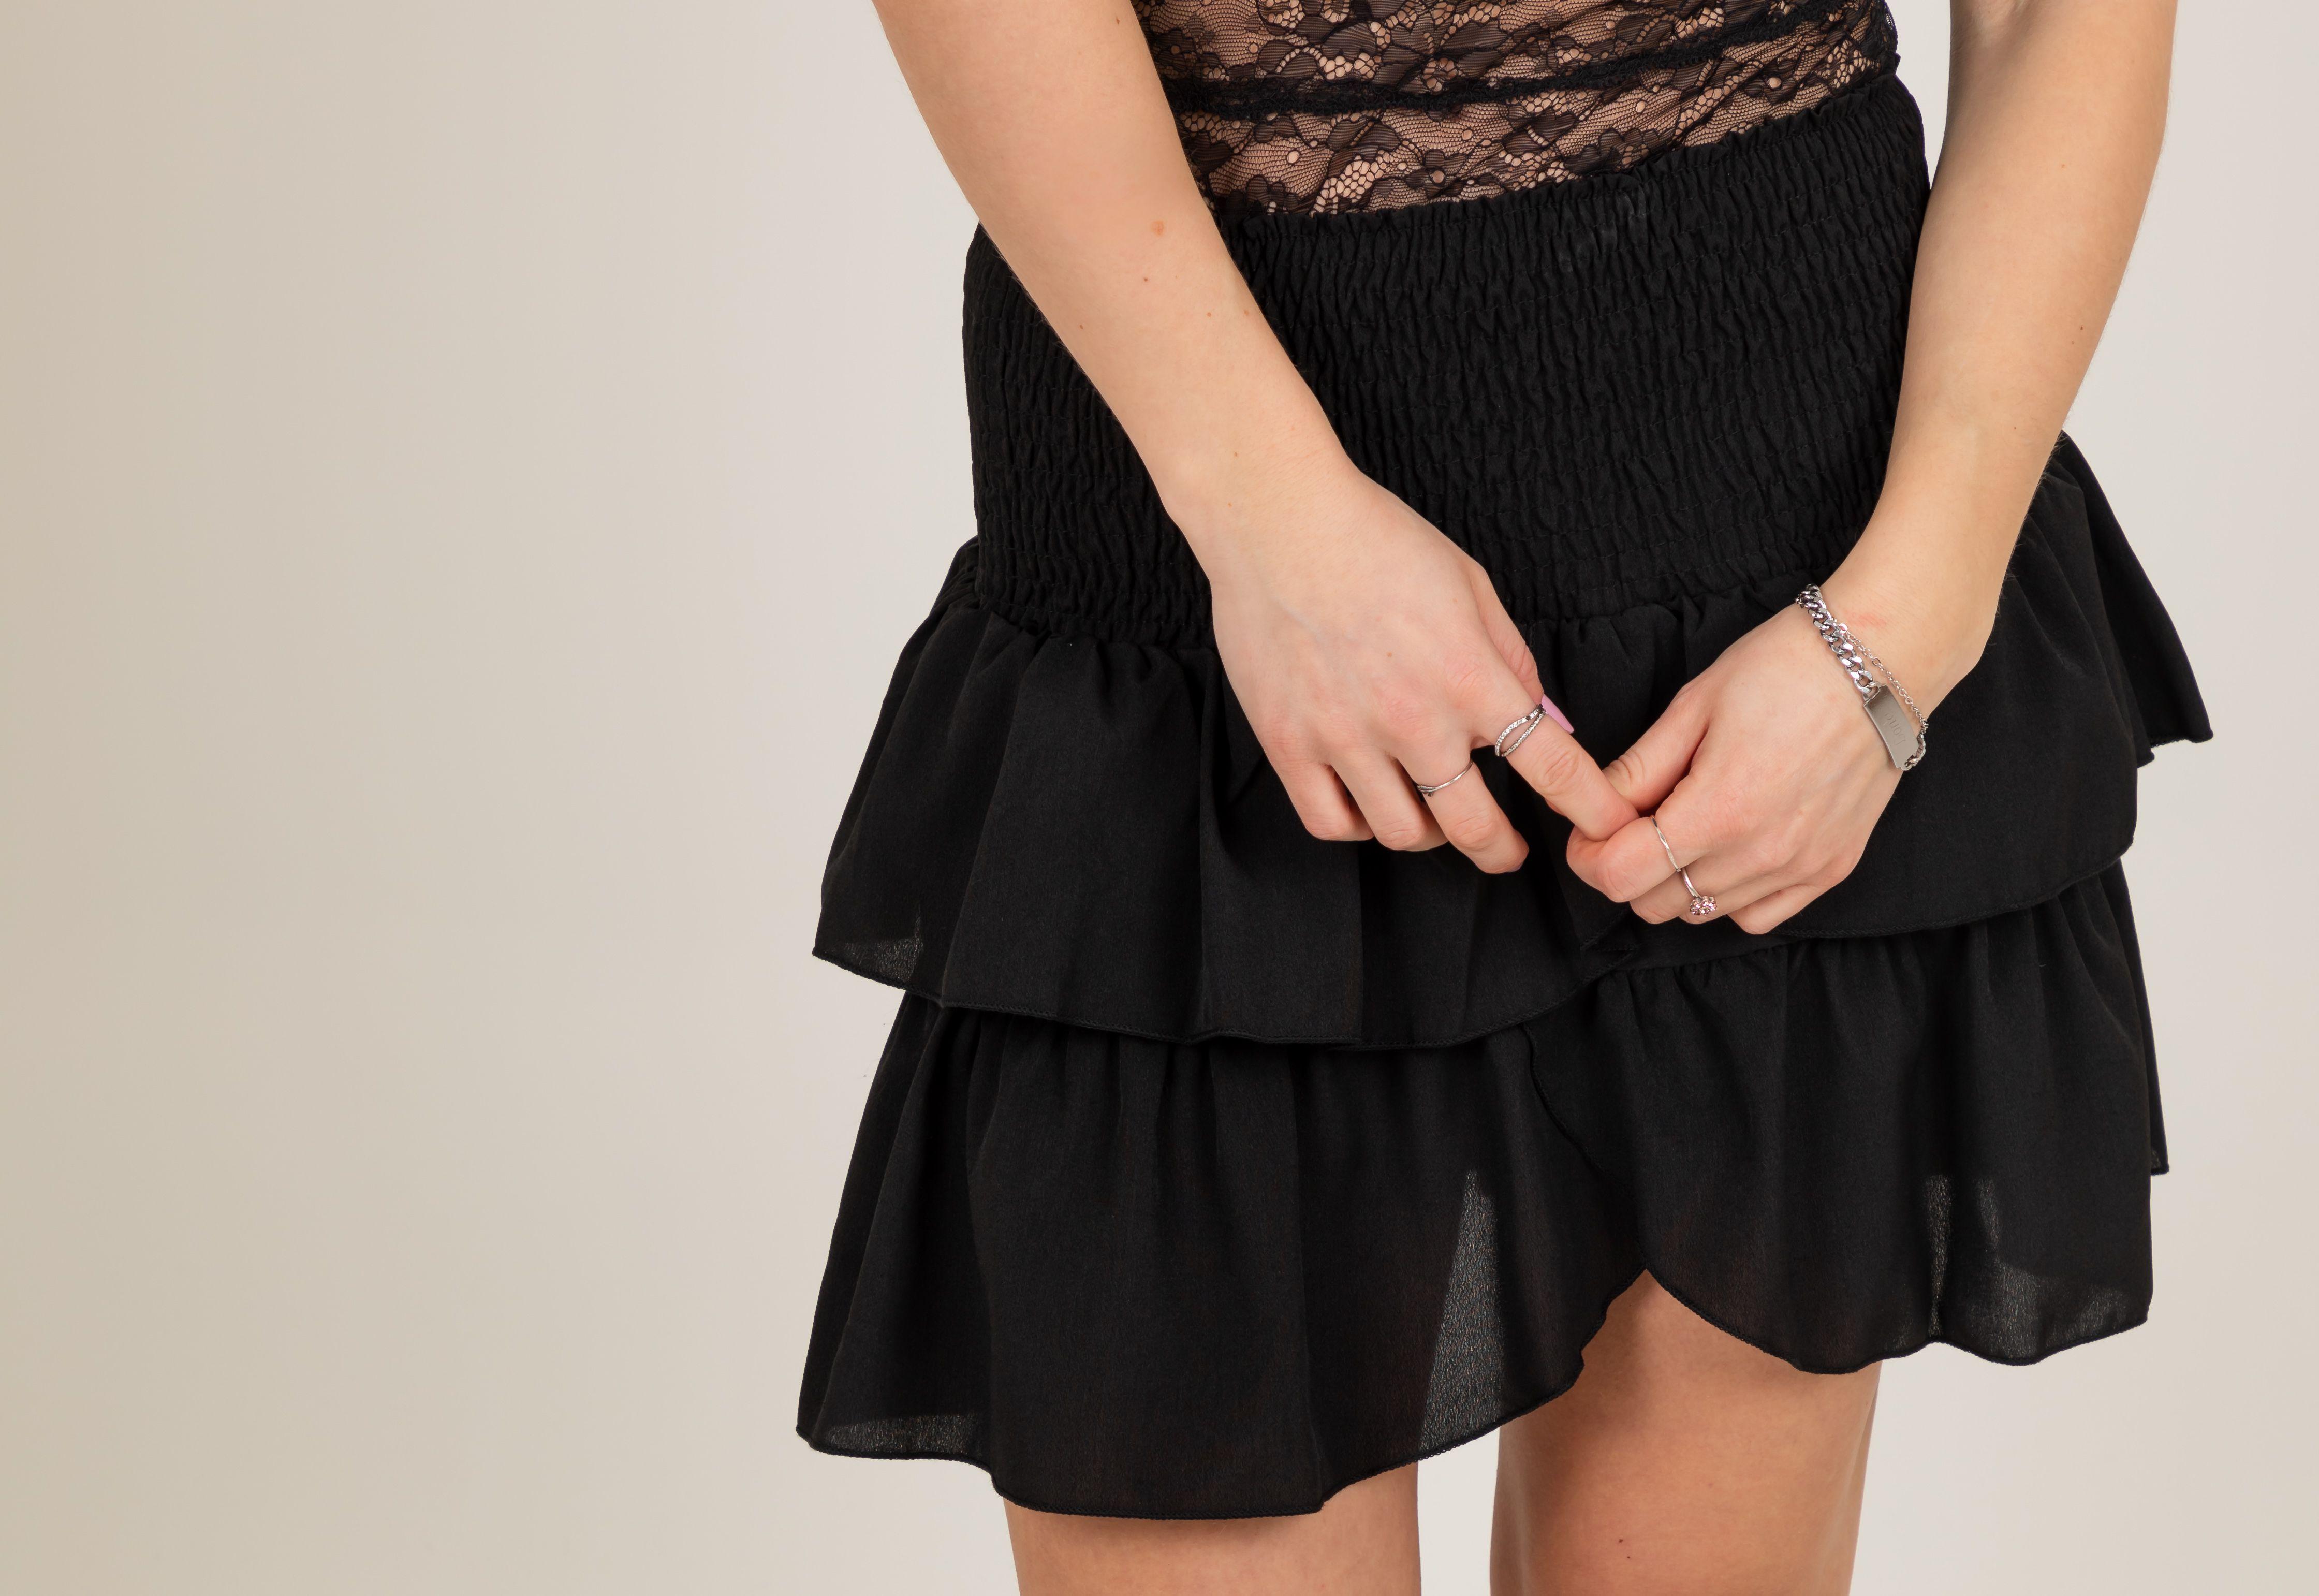 Neo Noir Carin skirt, black, x-small